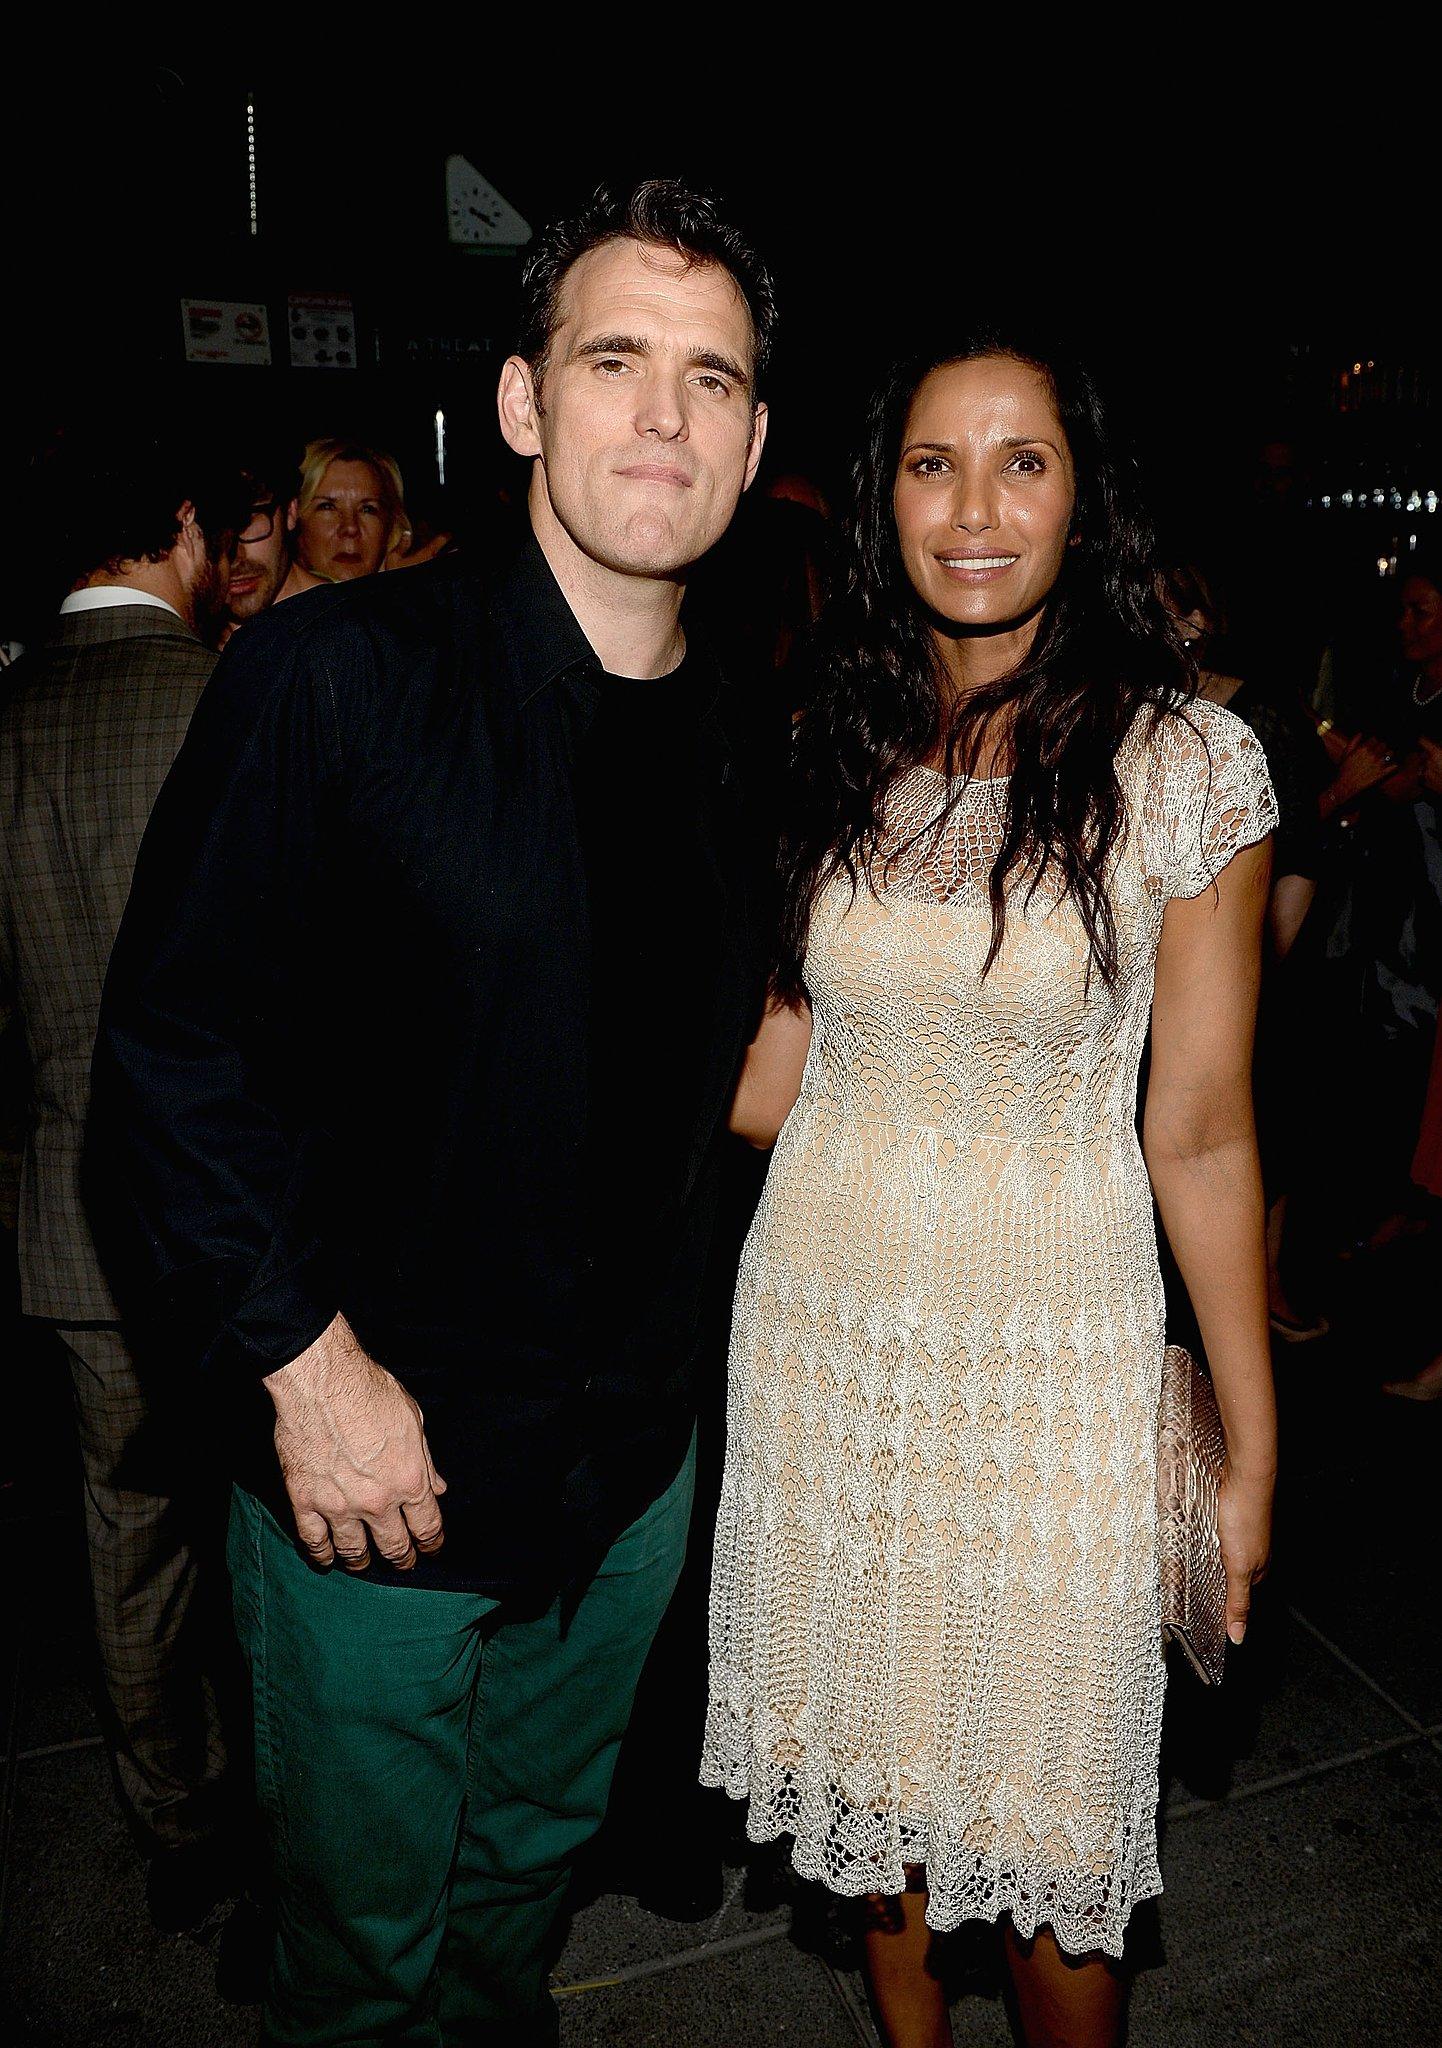 Matt Dillon mingled at the afterparty with Padma Lakshmi.